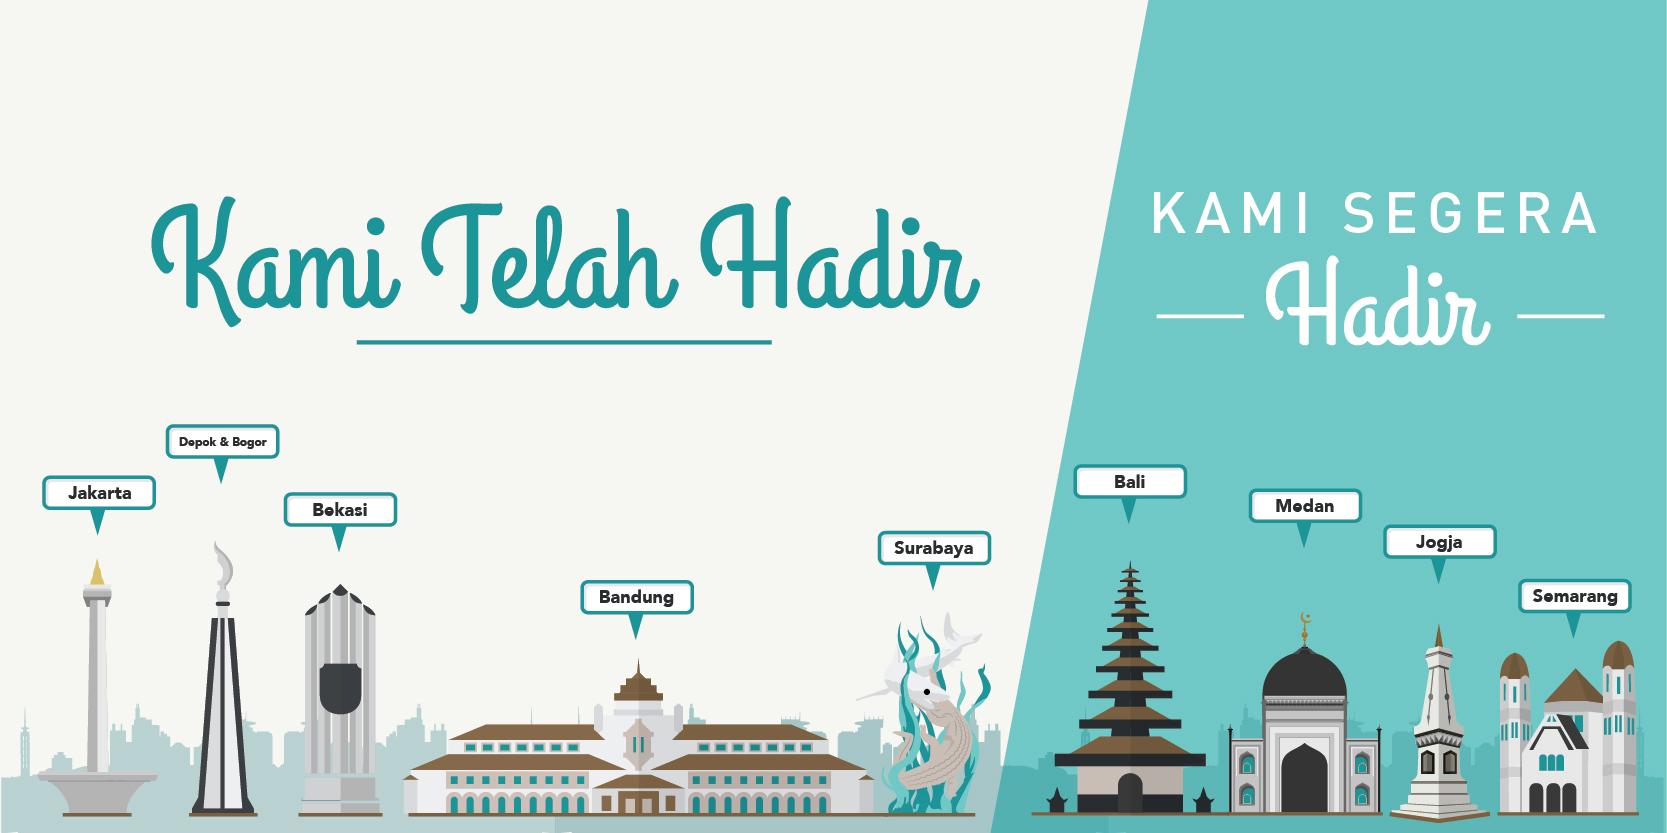 Meningkatnya Peminat, GO-MASSAGE Melakukan Ekspansi Ke Bandung & Surabaya